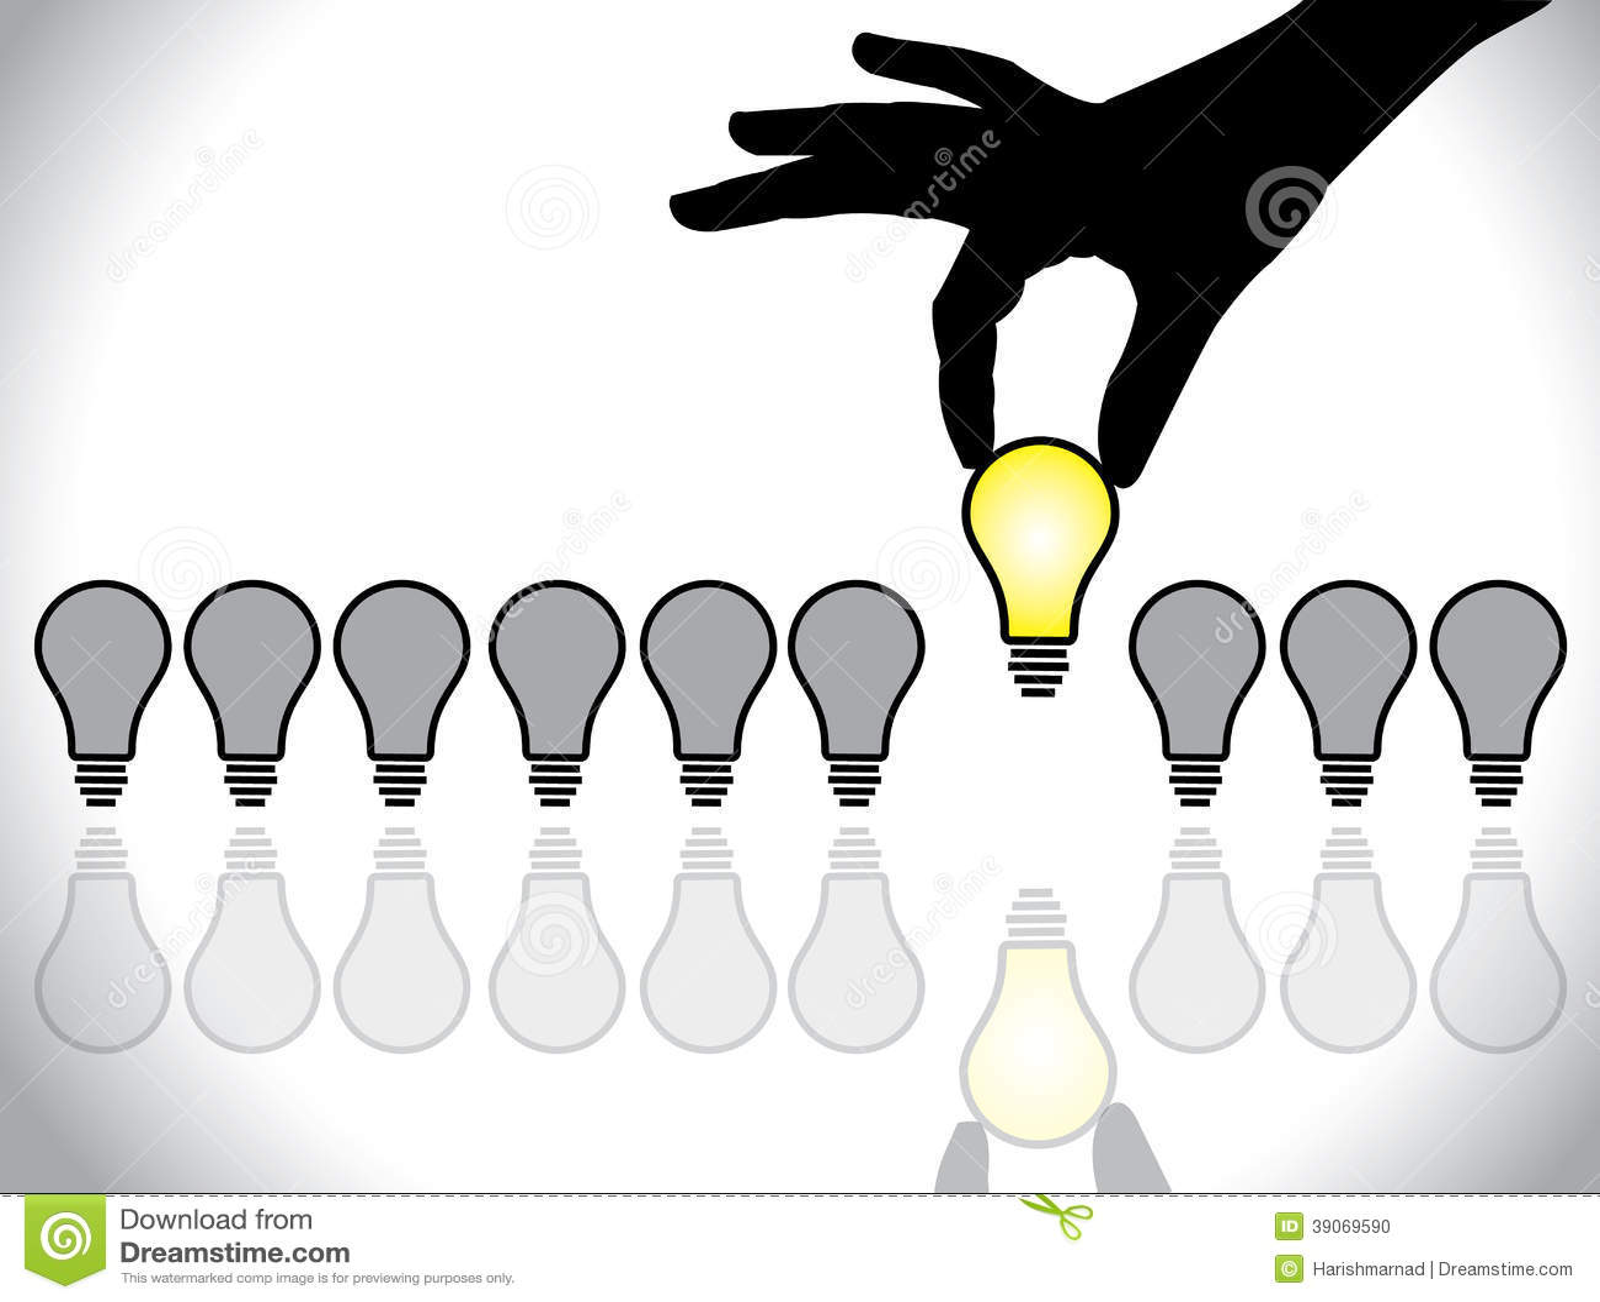 Choosing The Best Idea Lightbulb Concept